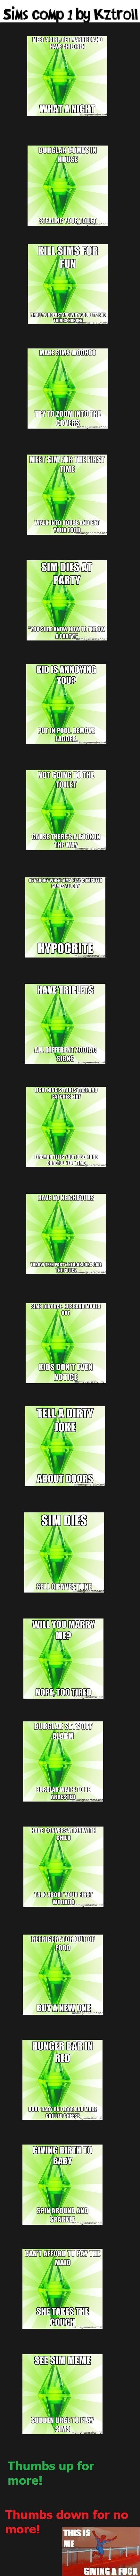 Sims comp 1. . sins co o 1 o Kztroll l' Artil vrt, r, GEES t ] Licit W: MEIER wanna» mists the sims comp kztroll